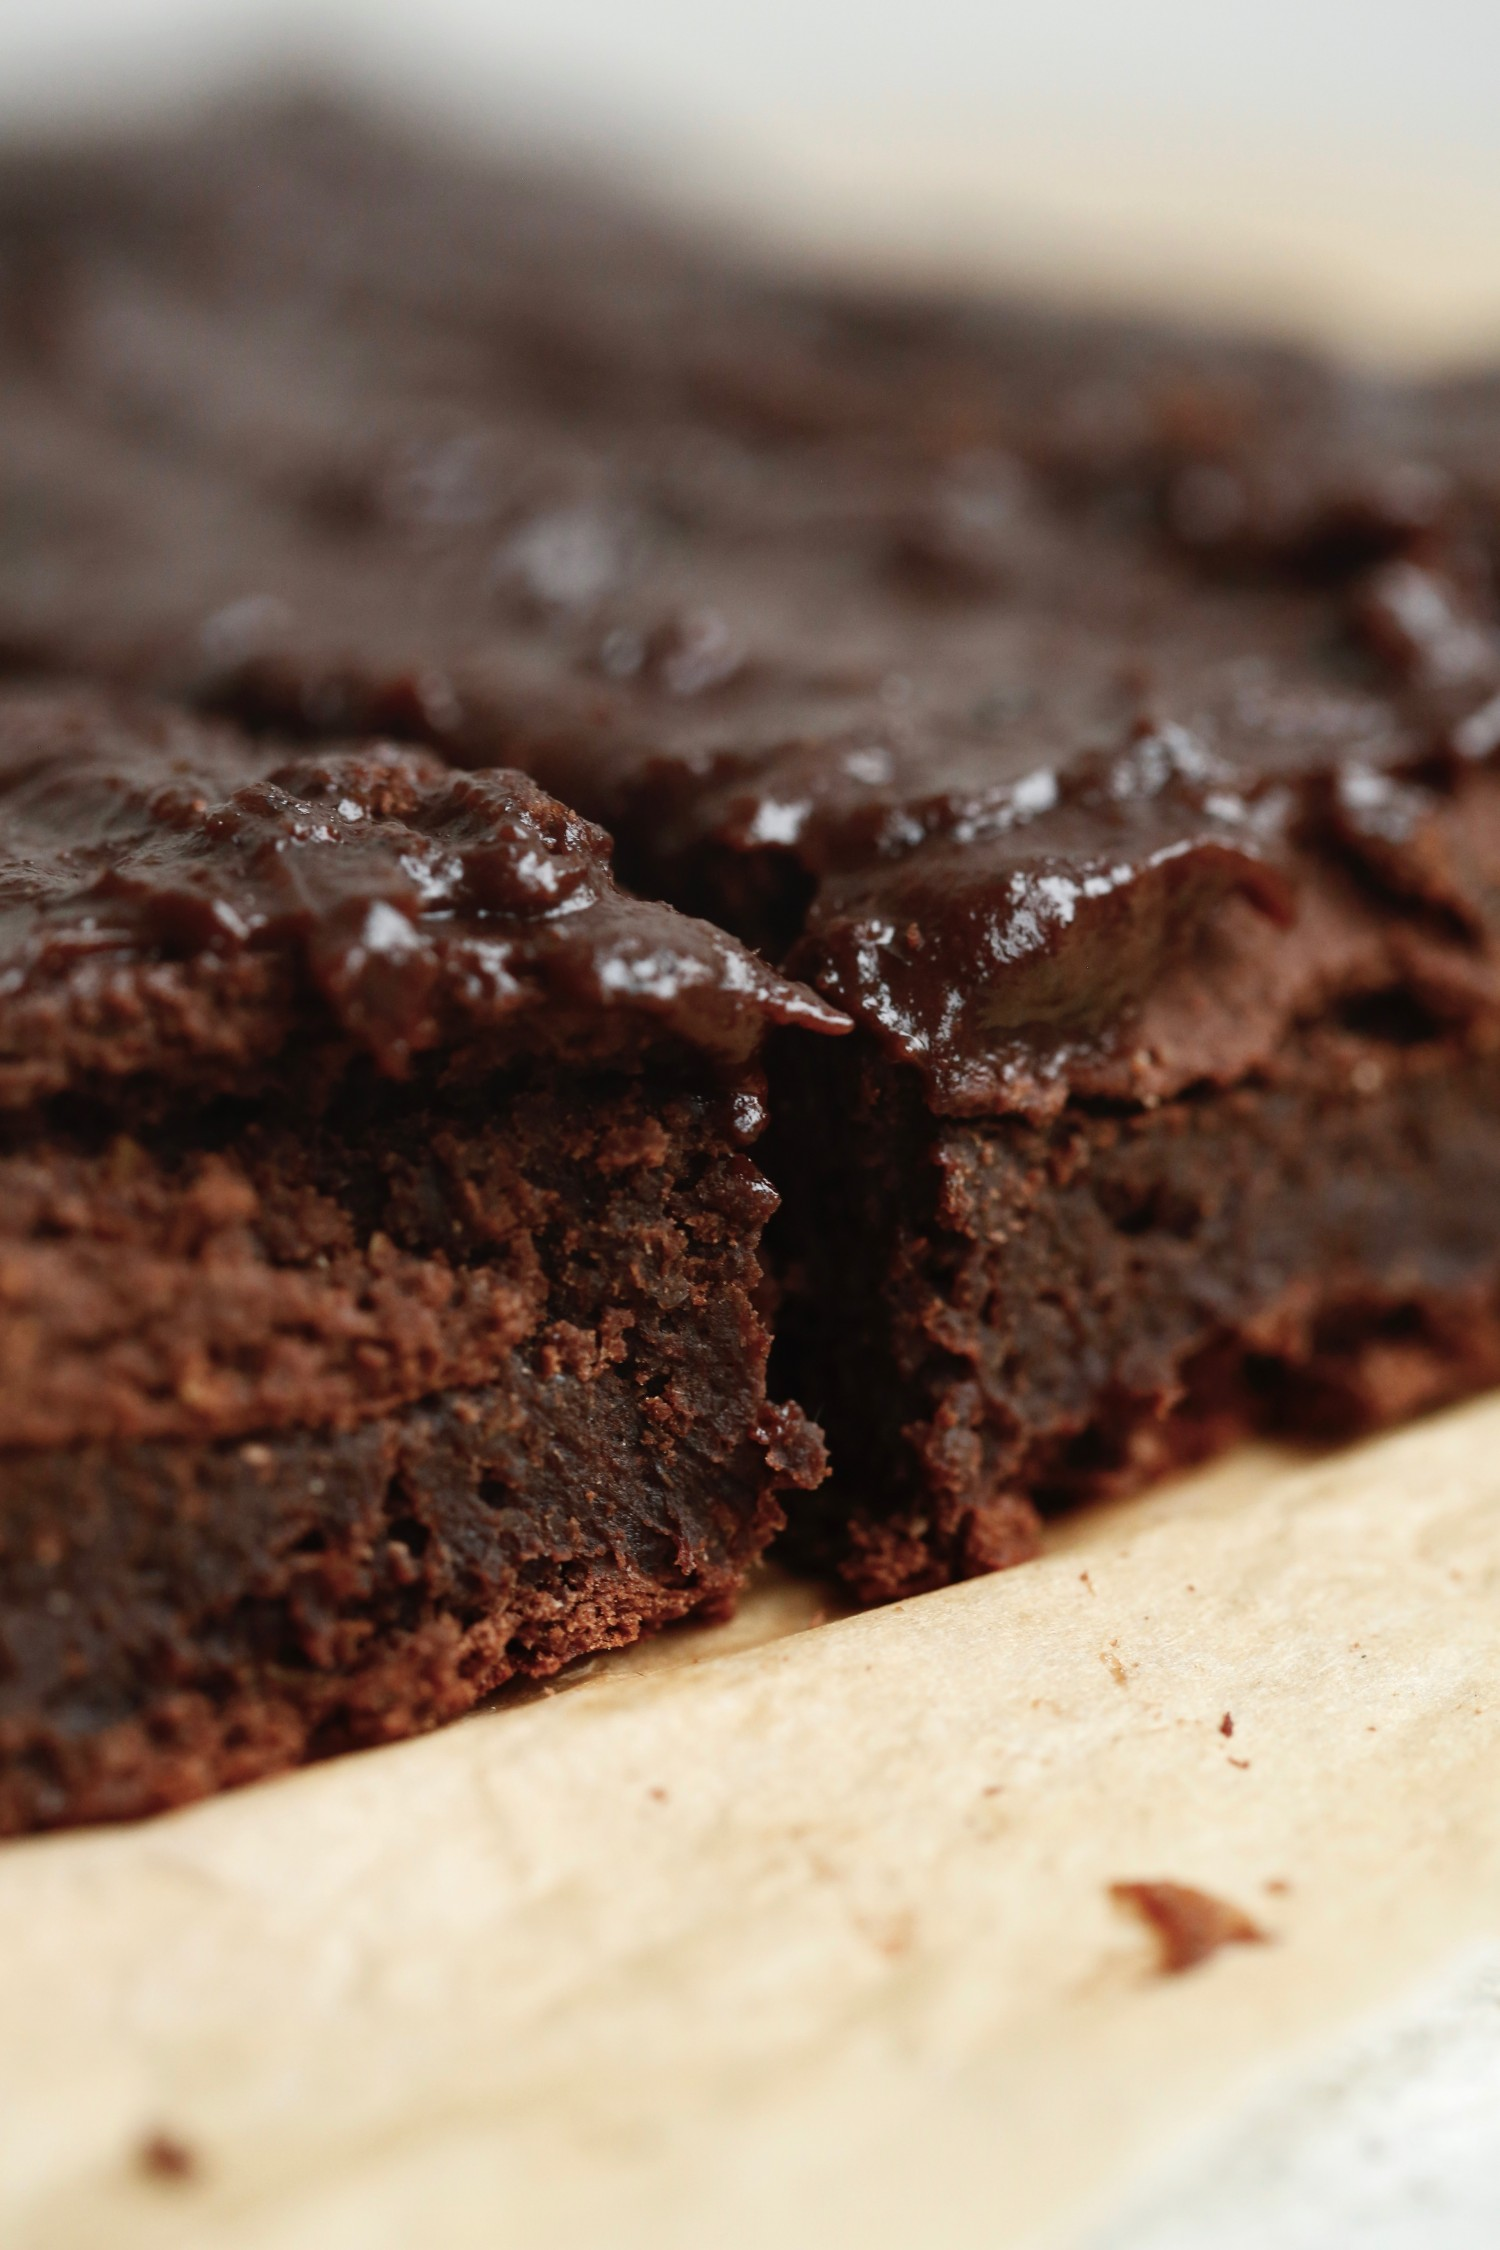 opskrift-laekker-chokoladebrownie-med-kikaerter-1